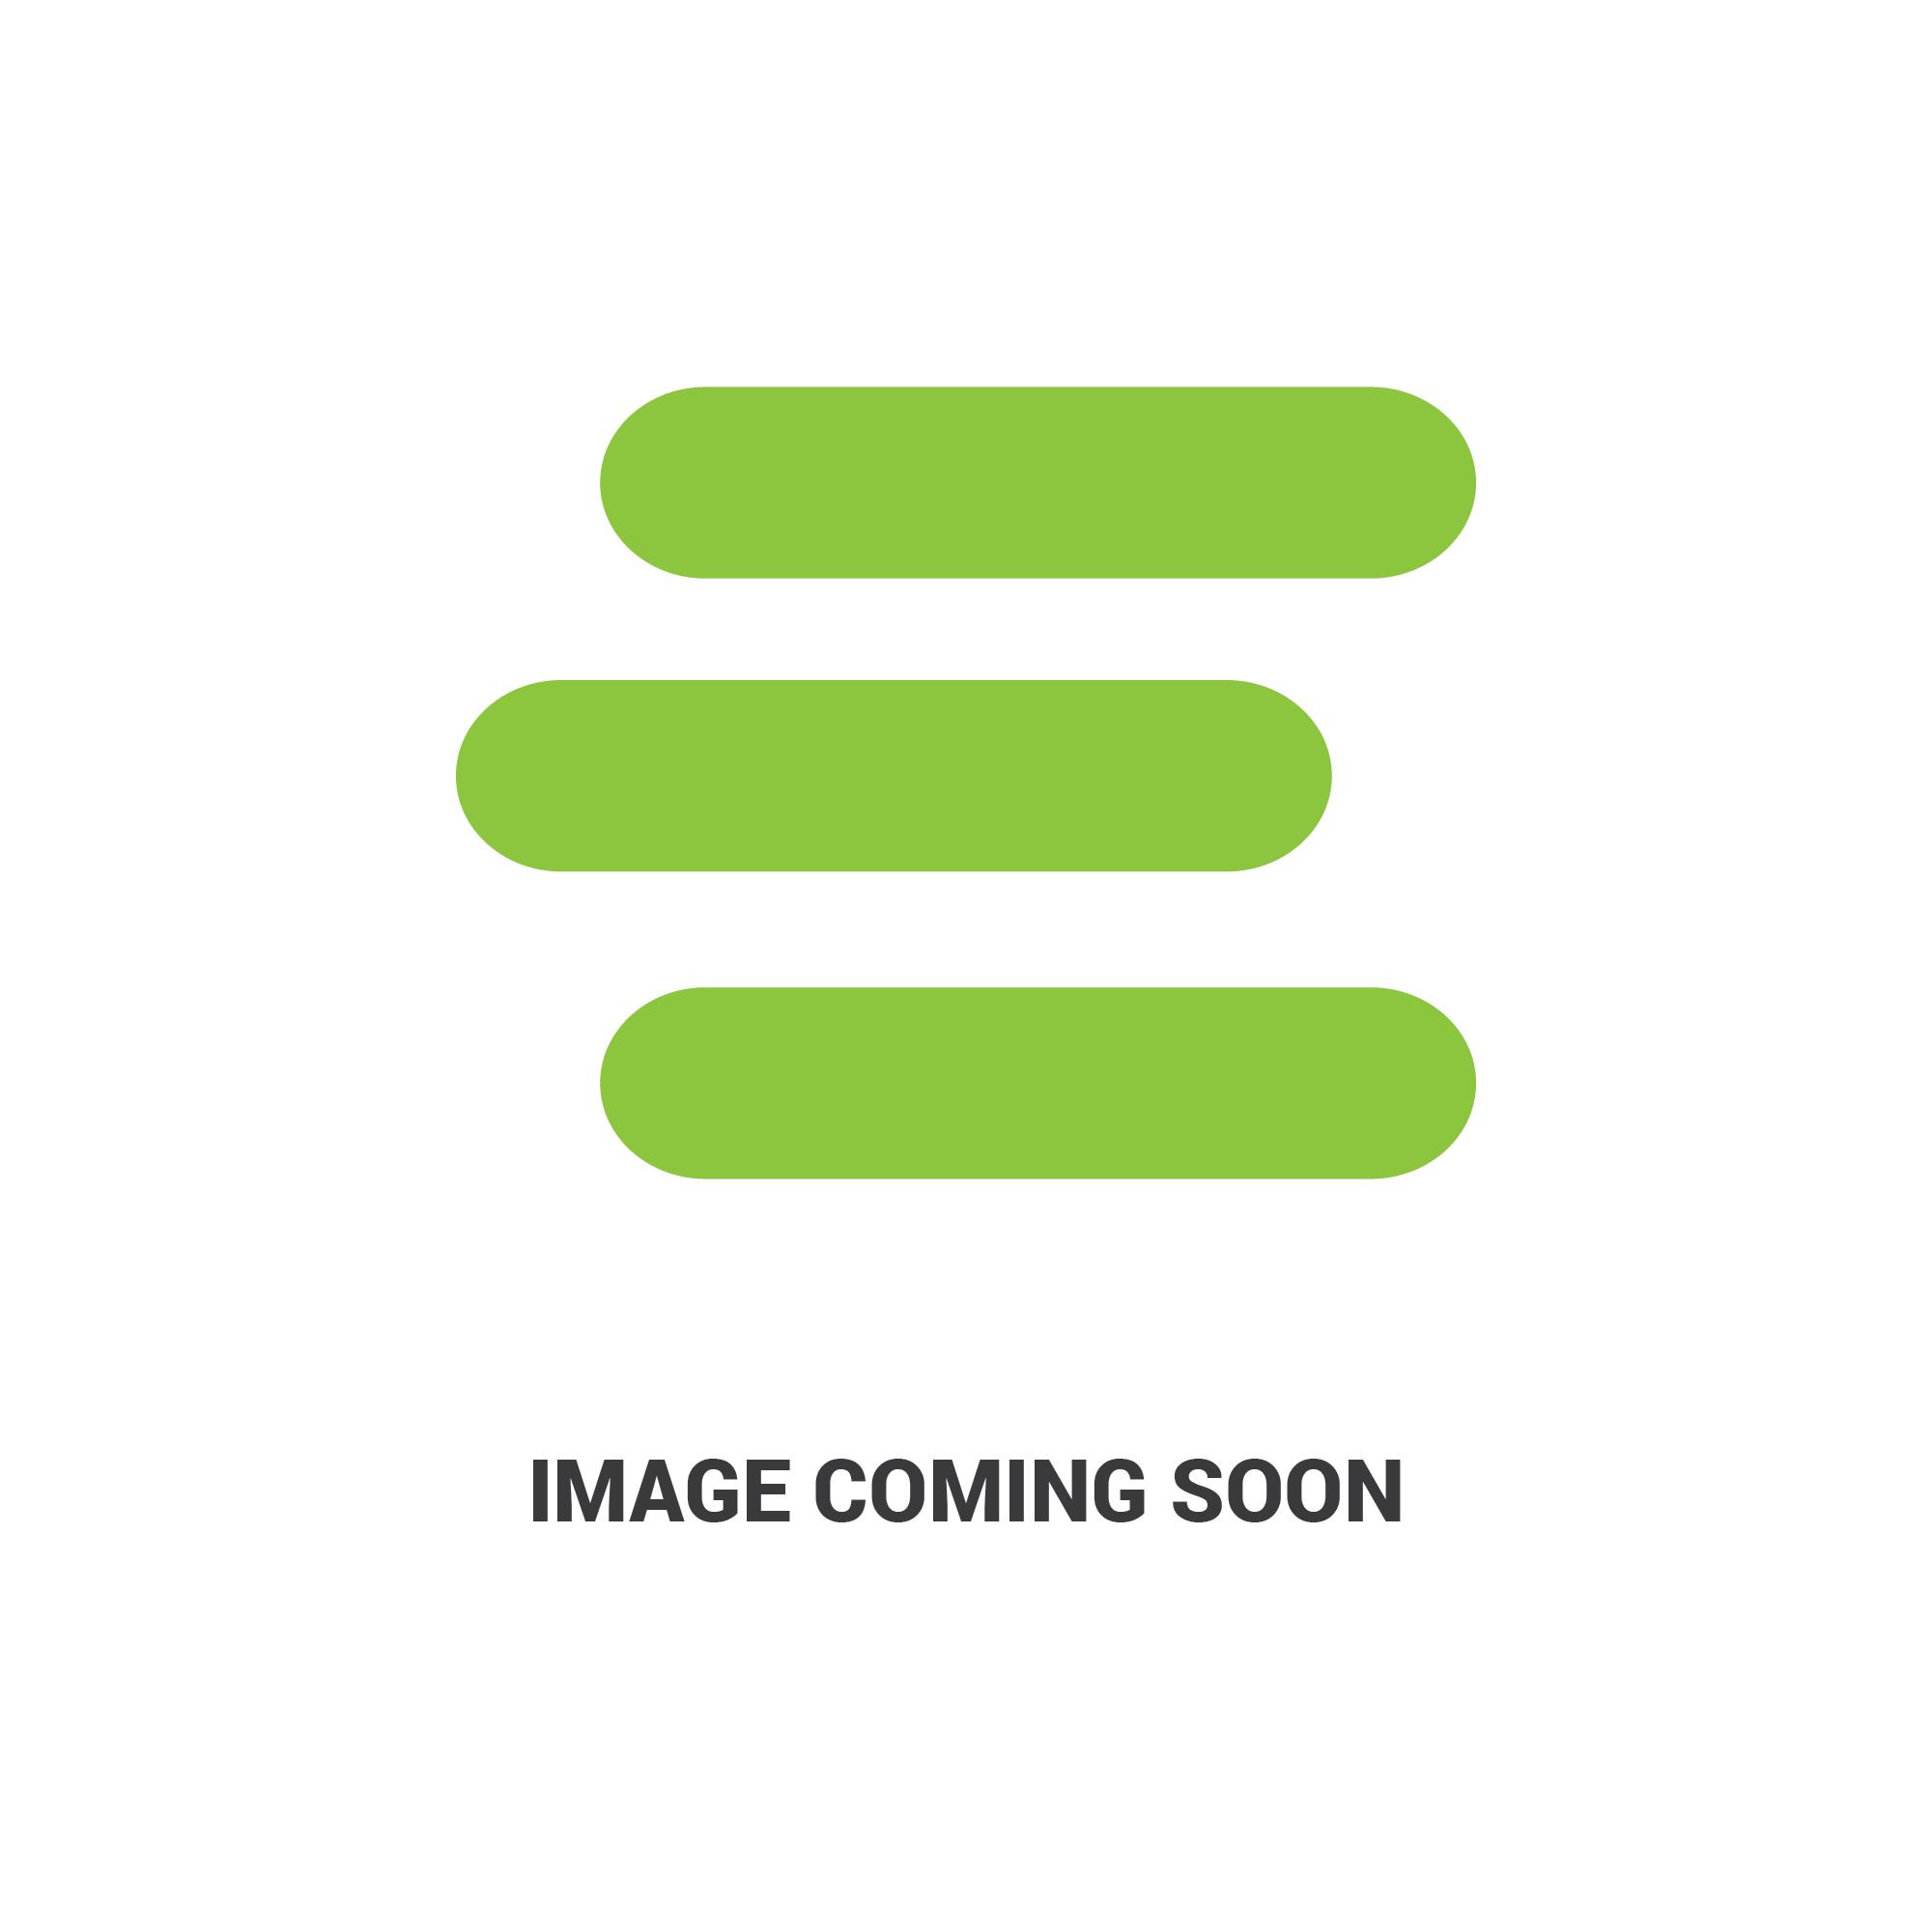 E-6691714edit 1.jpg